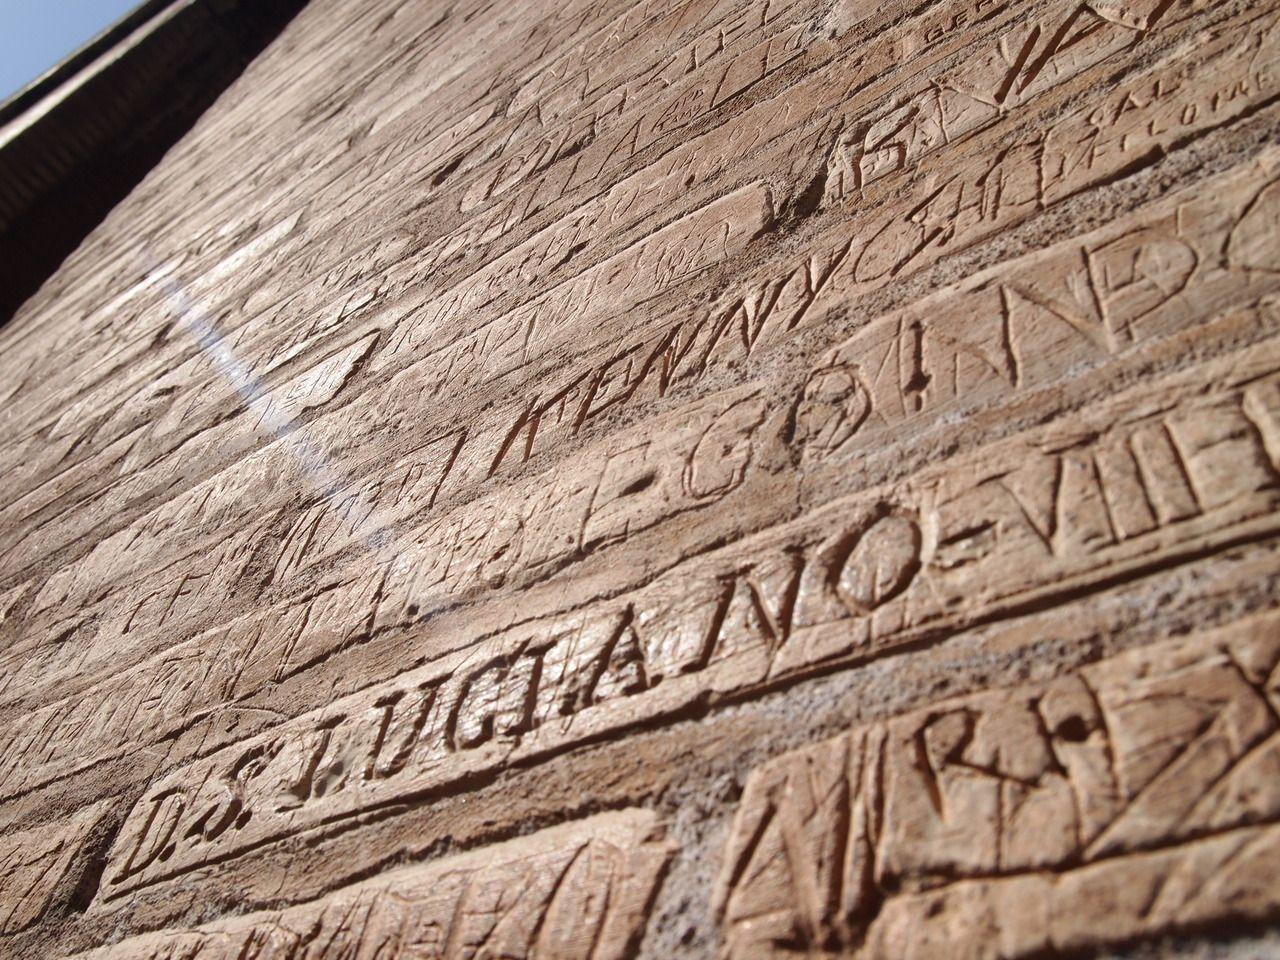 Ancient roman graffiti inscribed on the colosseum